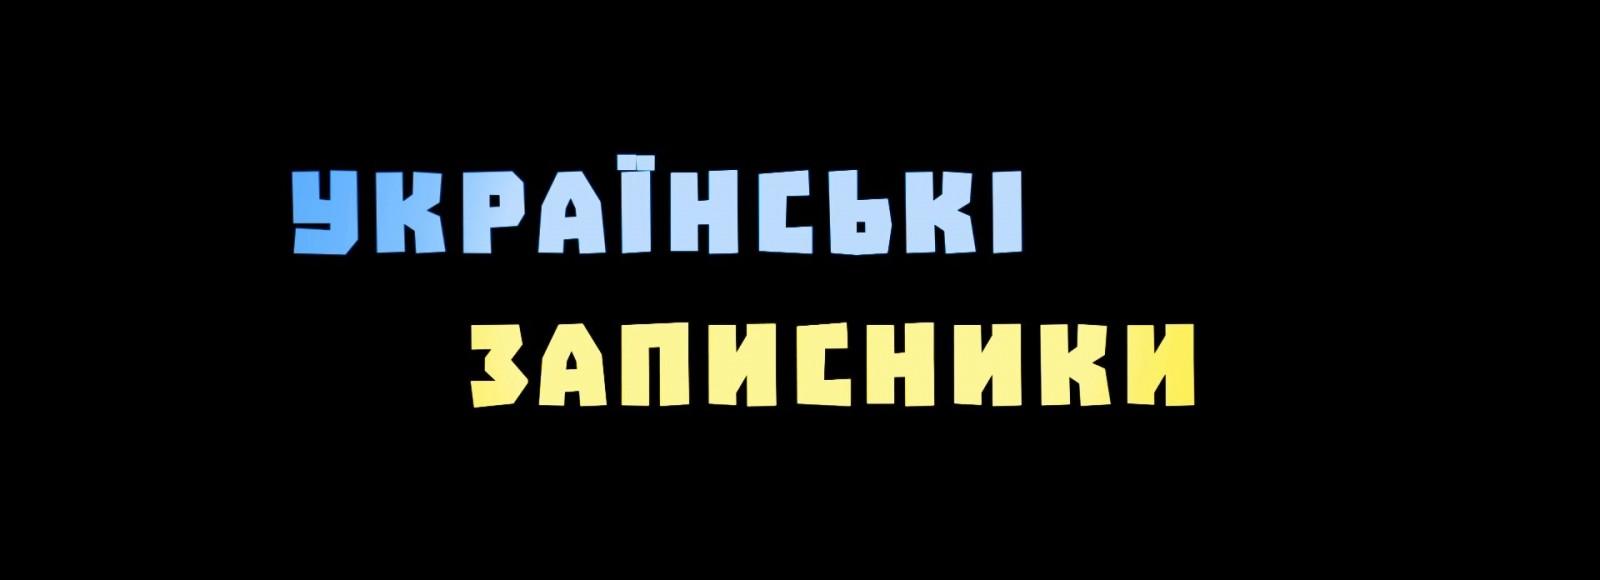 вапвапвапв